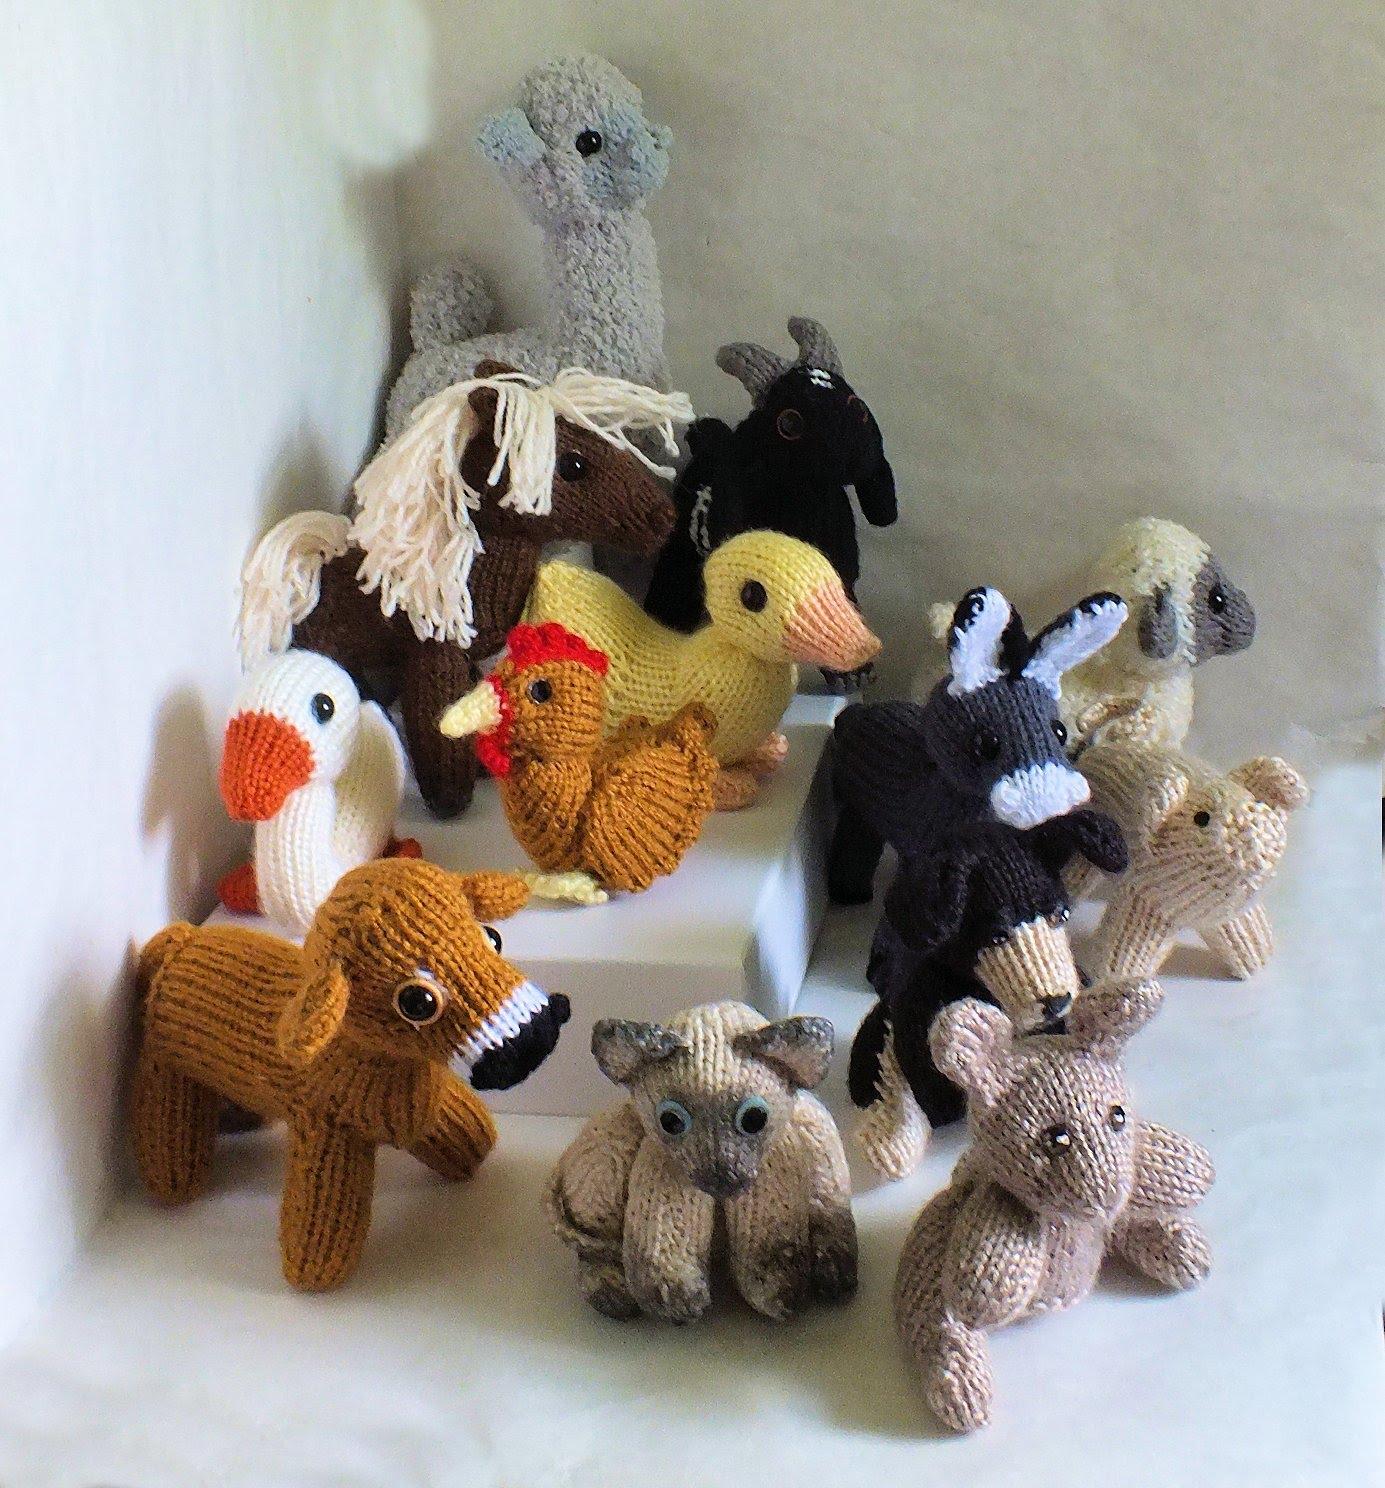 Knitting Stuffed Animals : Loom knitted stuffed animal pattern book in paperback